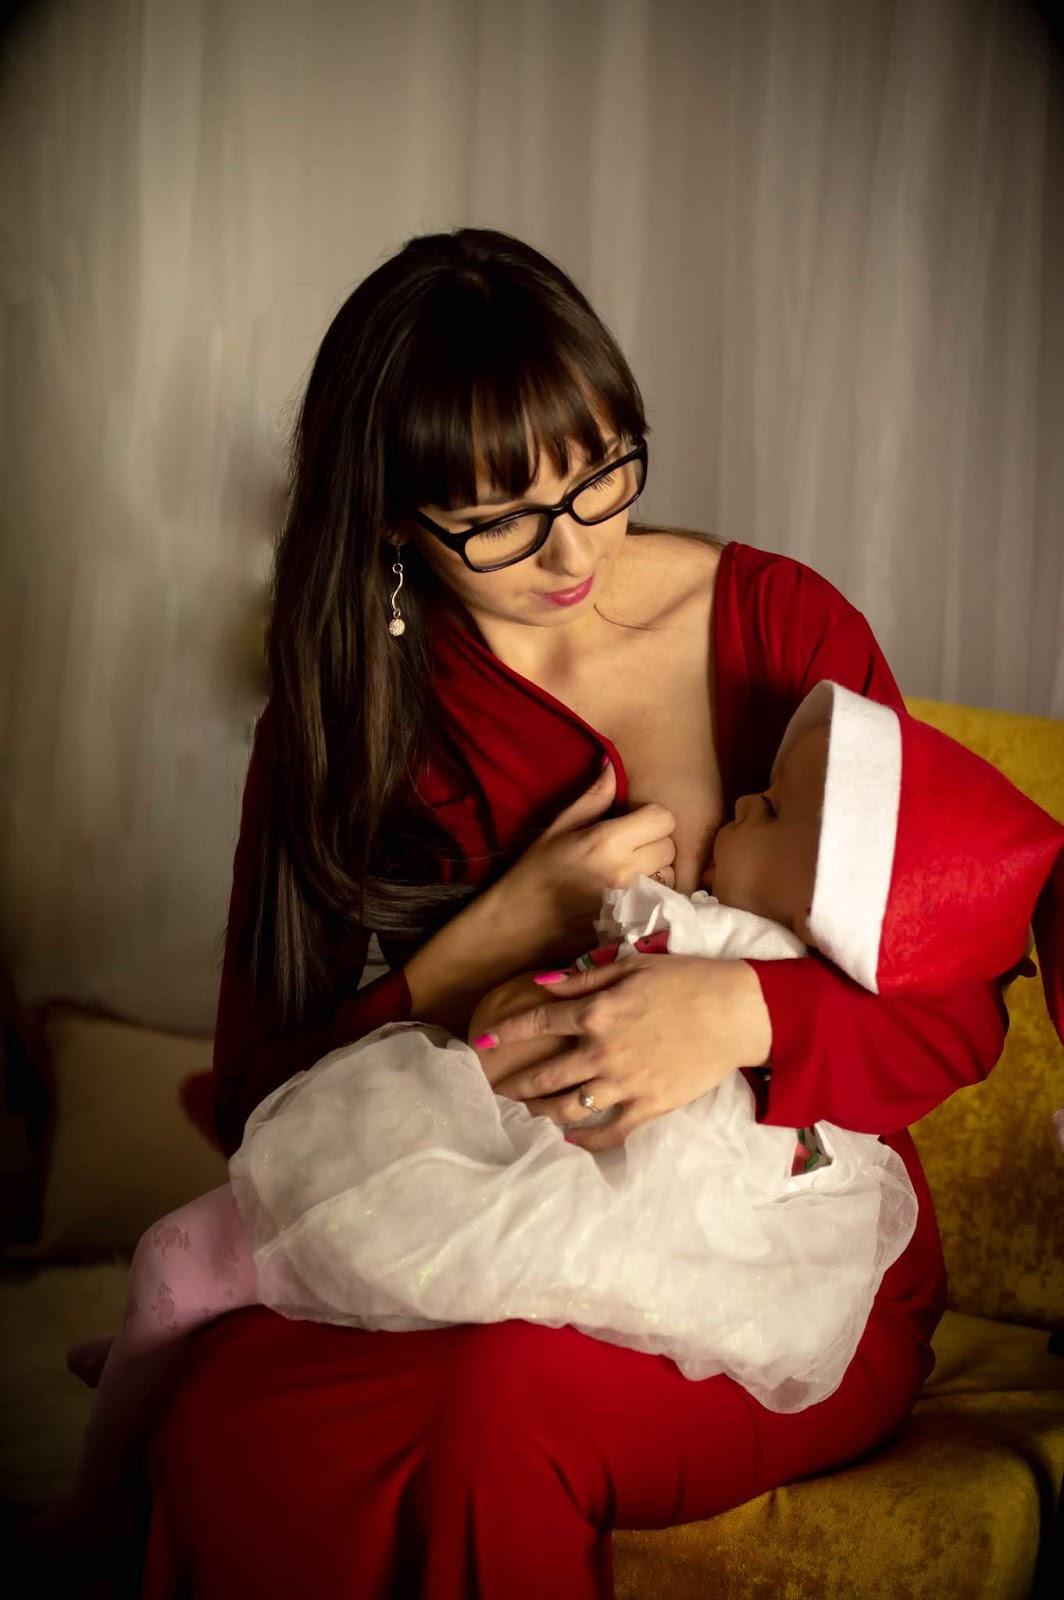 matka karmiąca piersią